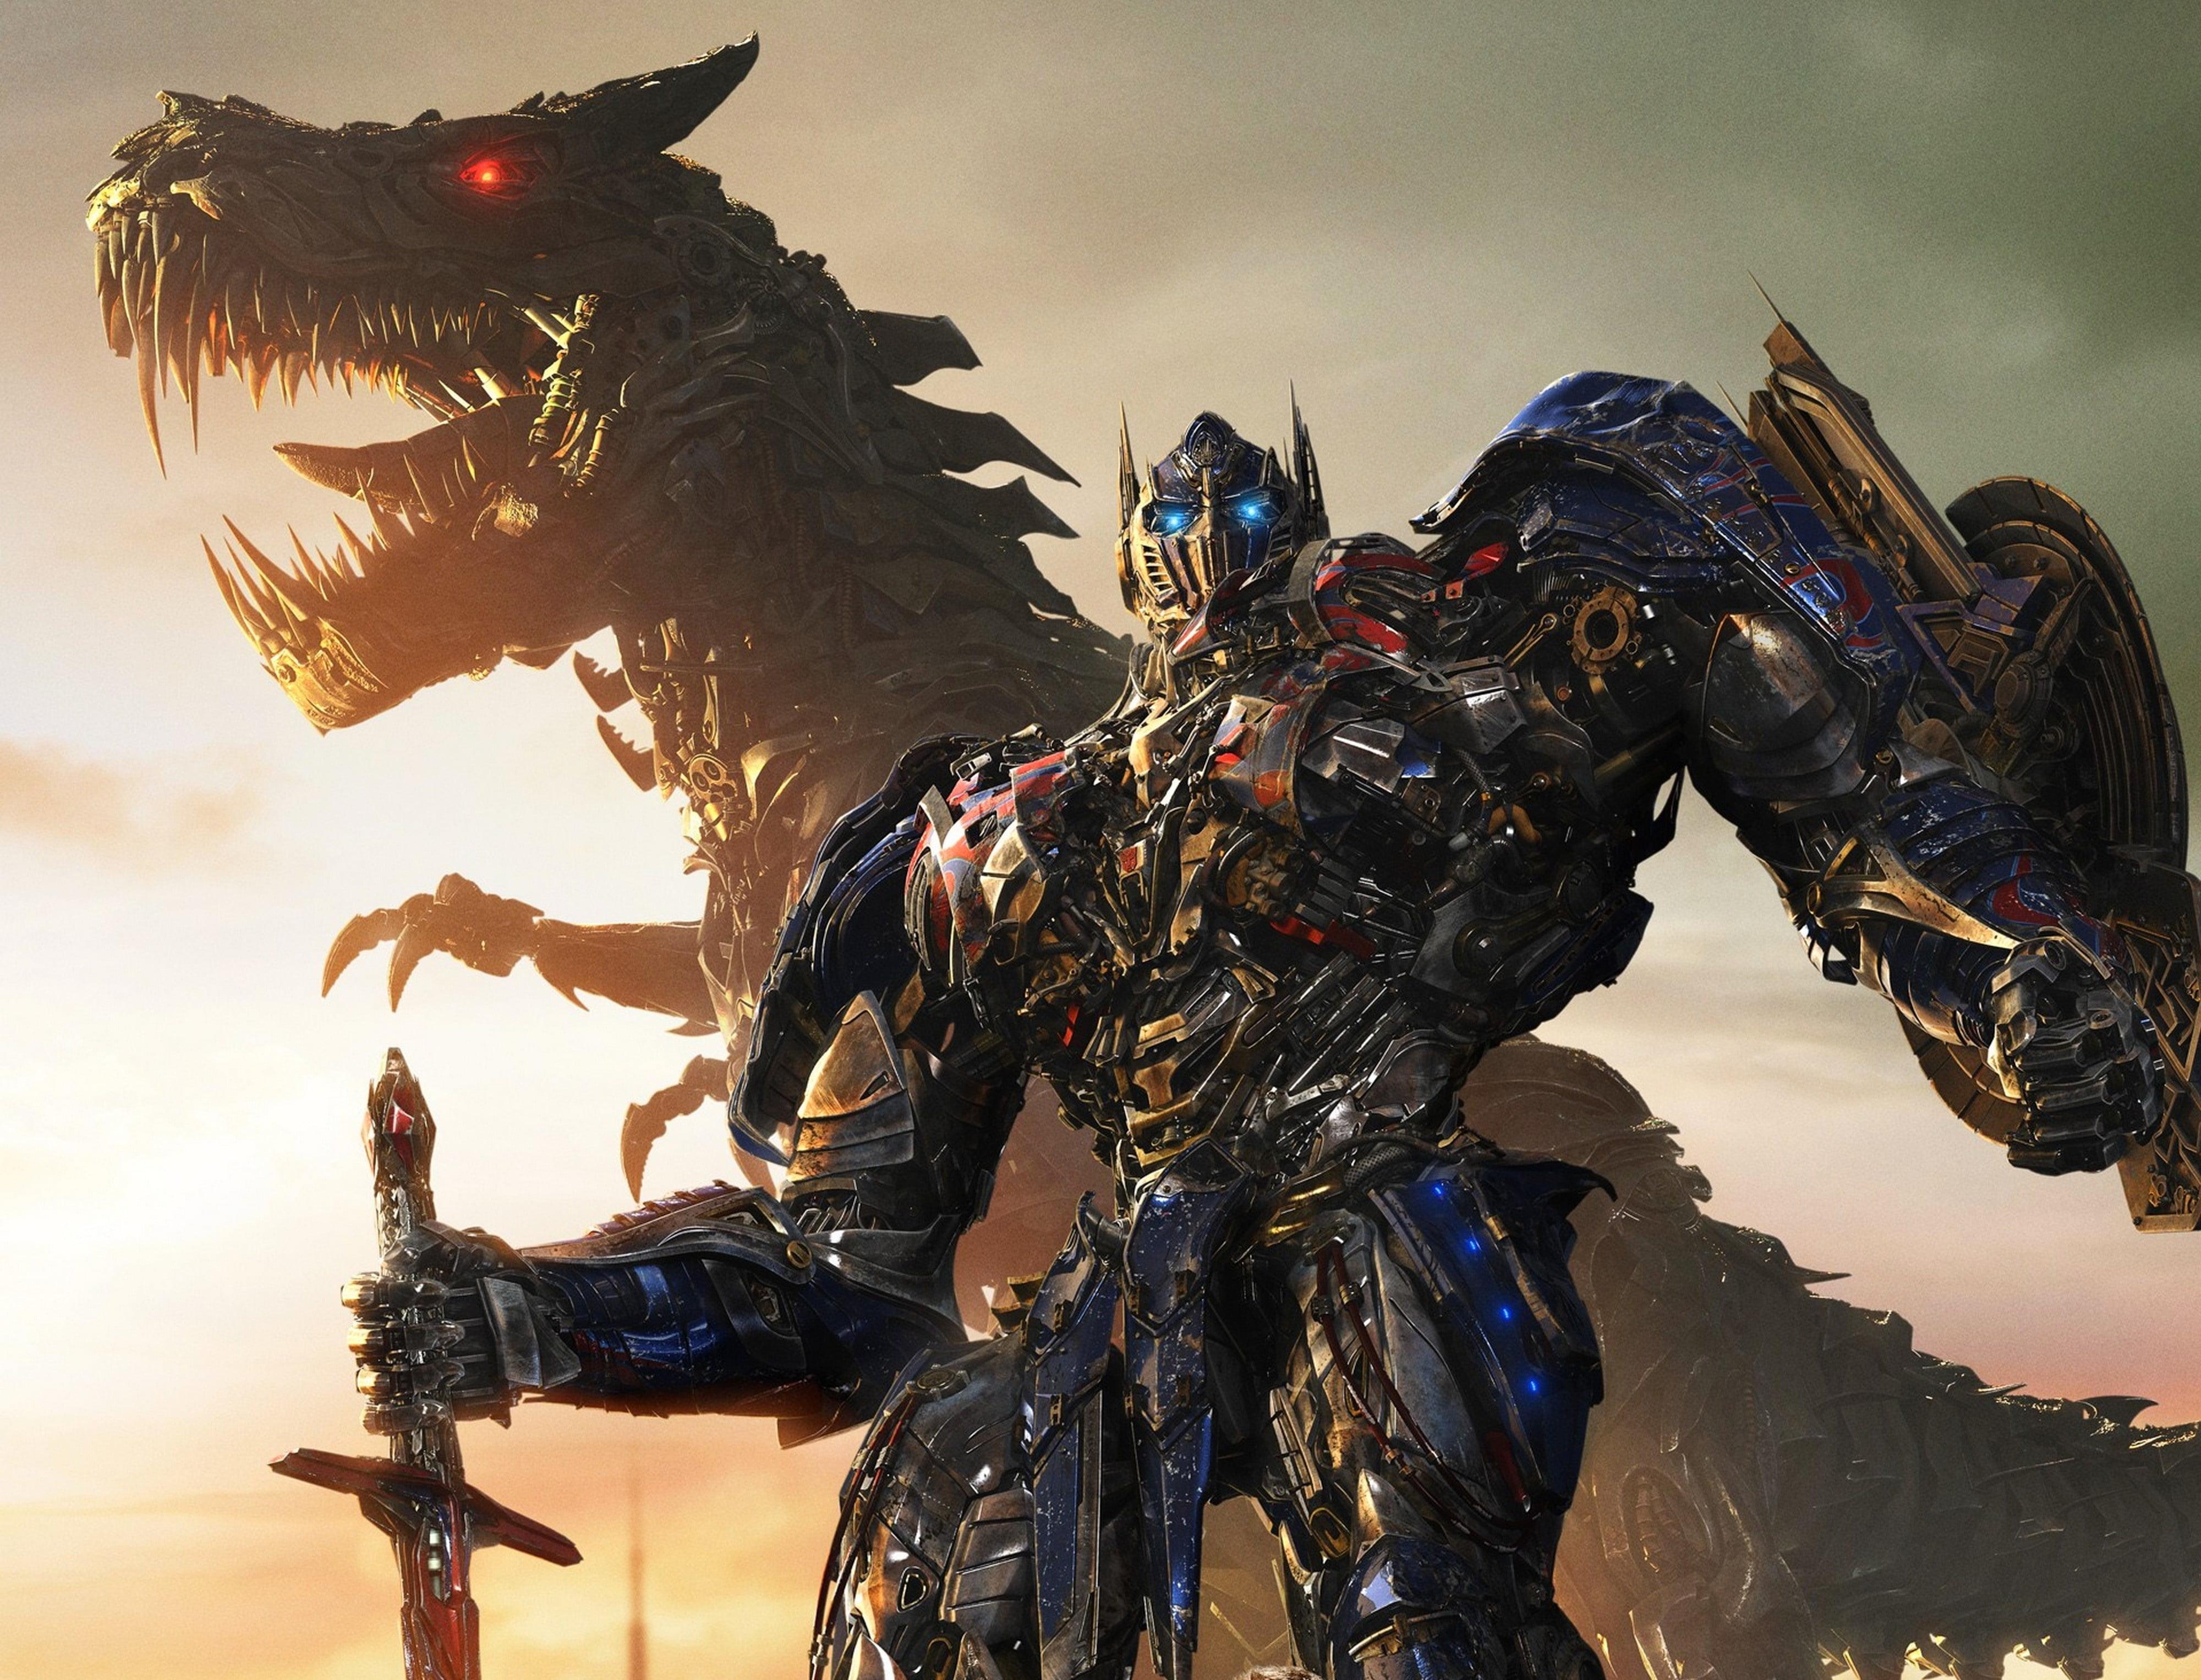 Optimus Prime And Grimlock Hd Wallpaper Transformers 4 1651771